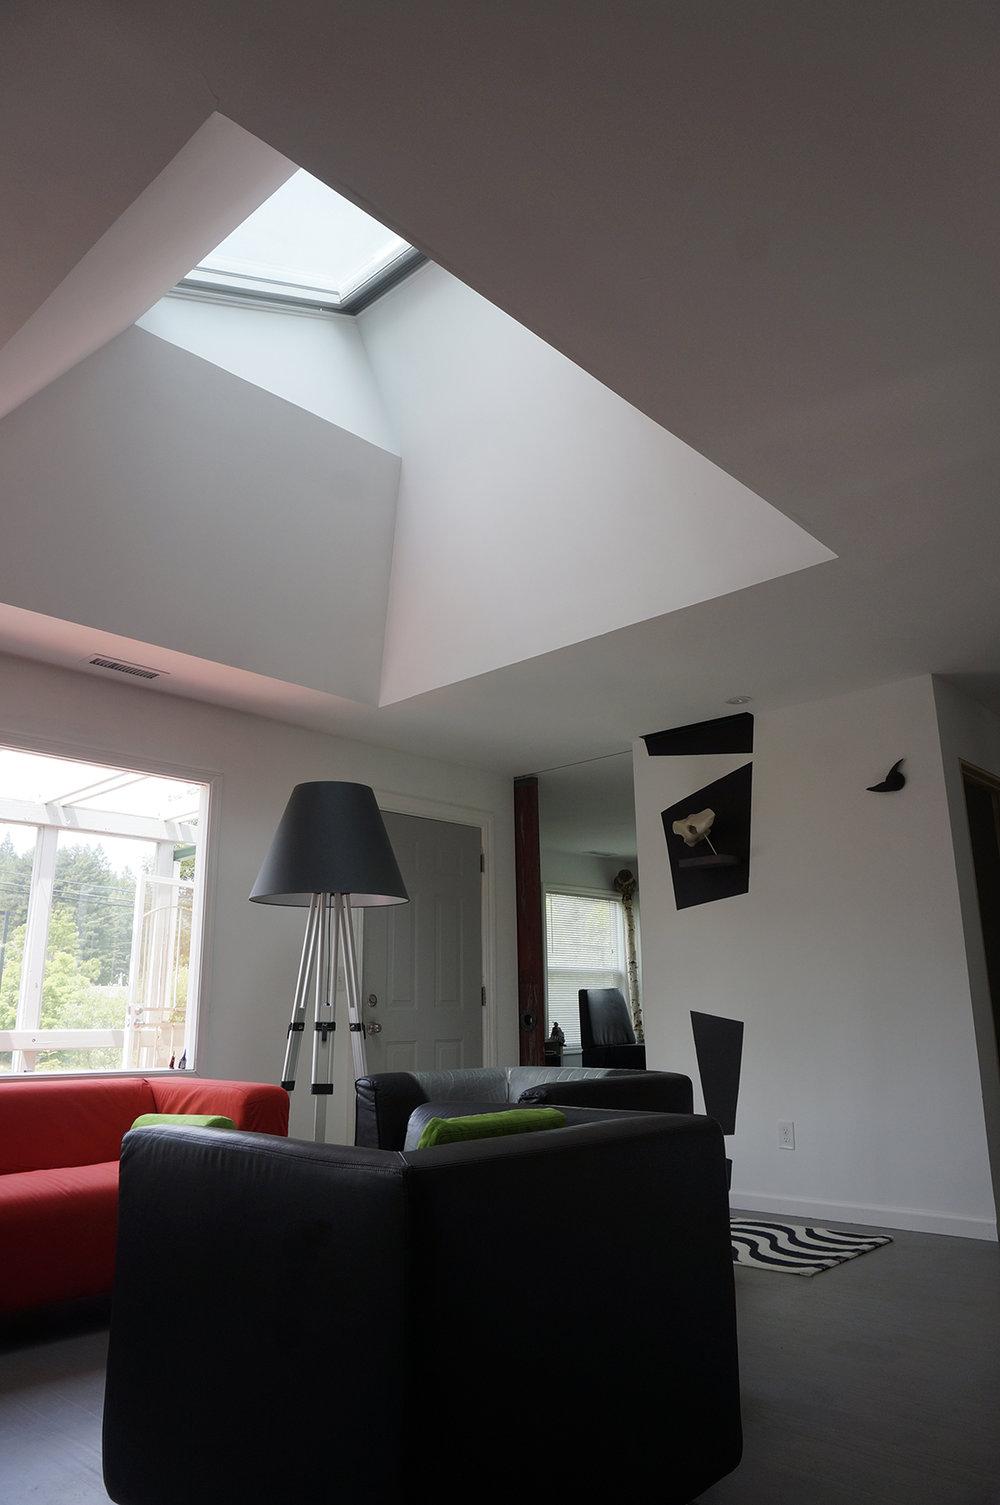 Origami Skylight